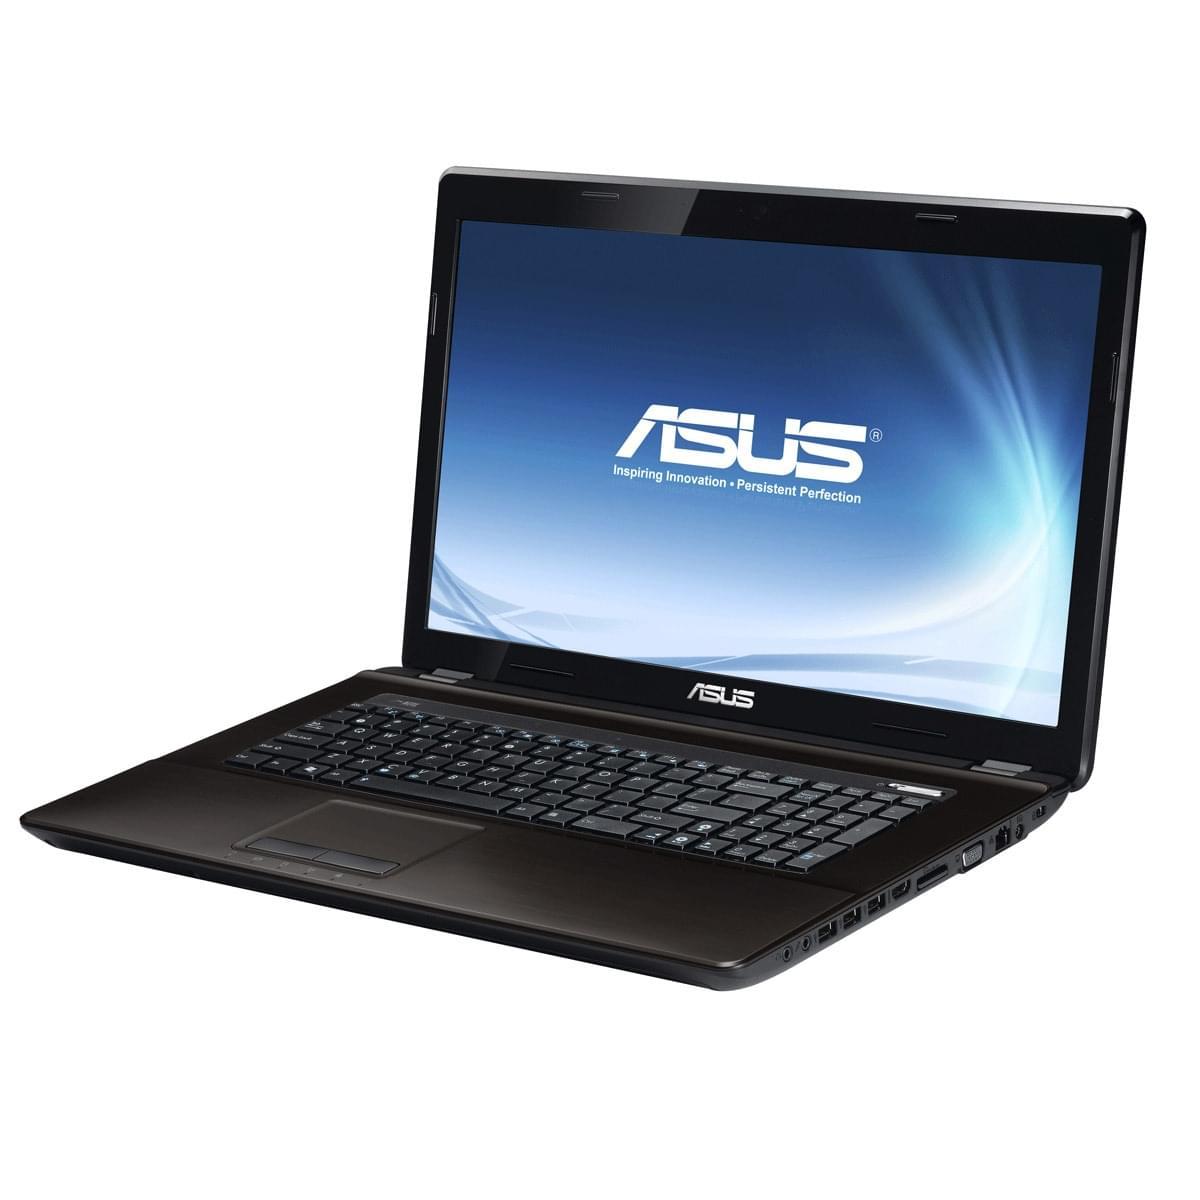 Asus K73E-TY202V (K73E-TY202V) - Achat / Vente PC Portable sur Cybertek.fr - 0